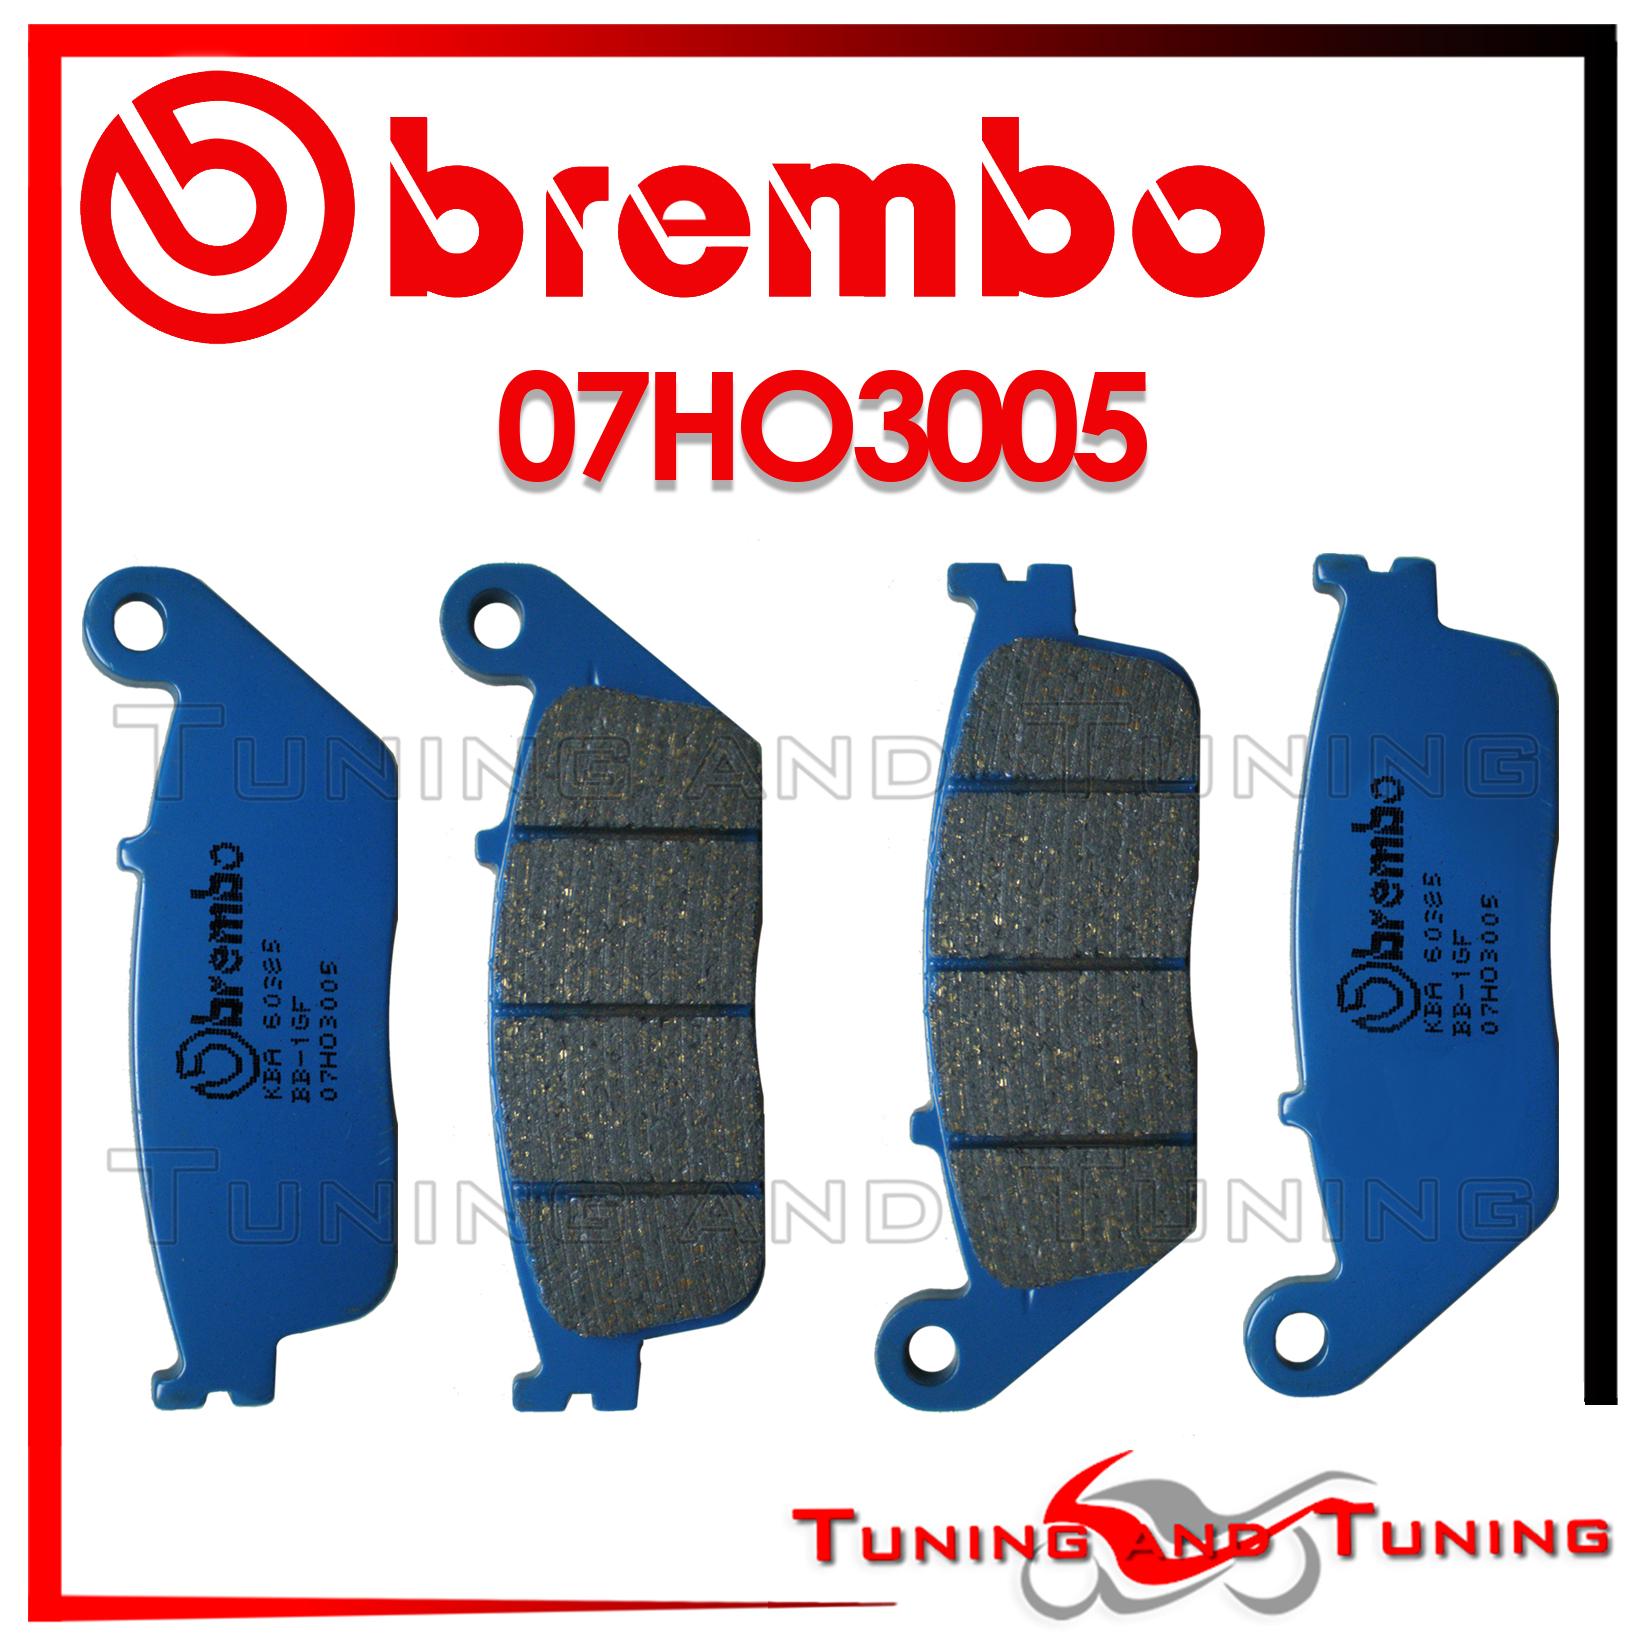 Pastiglie BREMBO CARBON CERAMICO HONDA CB F HORNET 600 2001 2002 2003 07HO3005